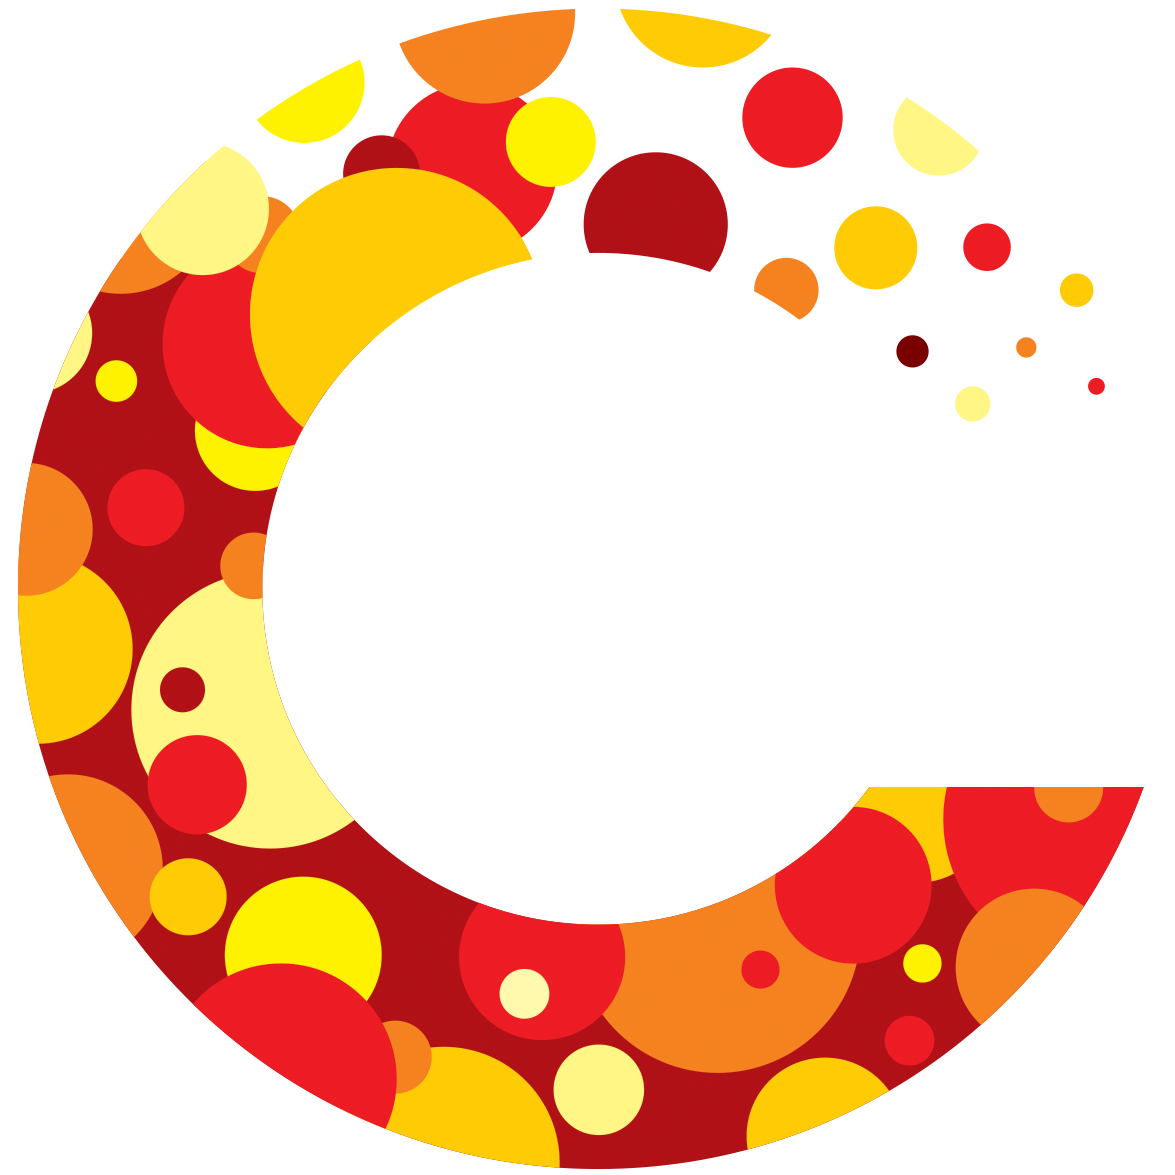 Ignite Alliance Business Partners